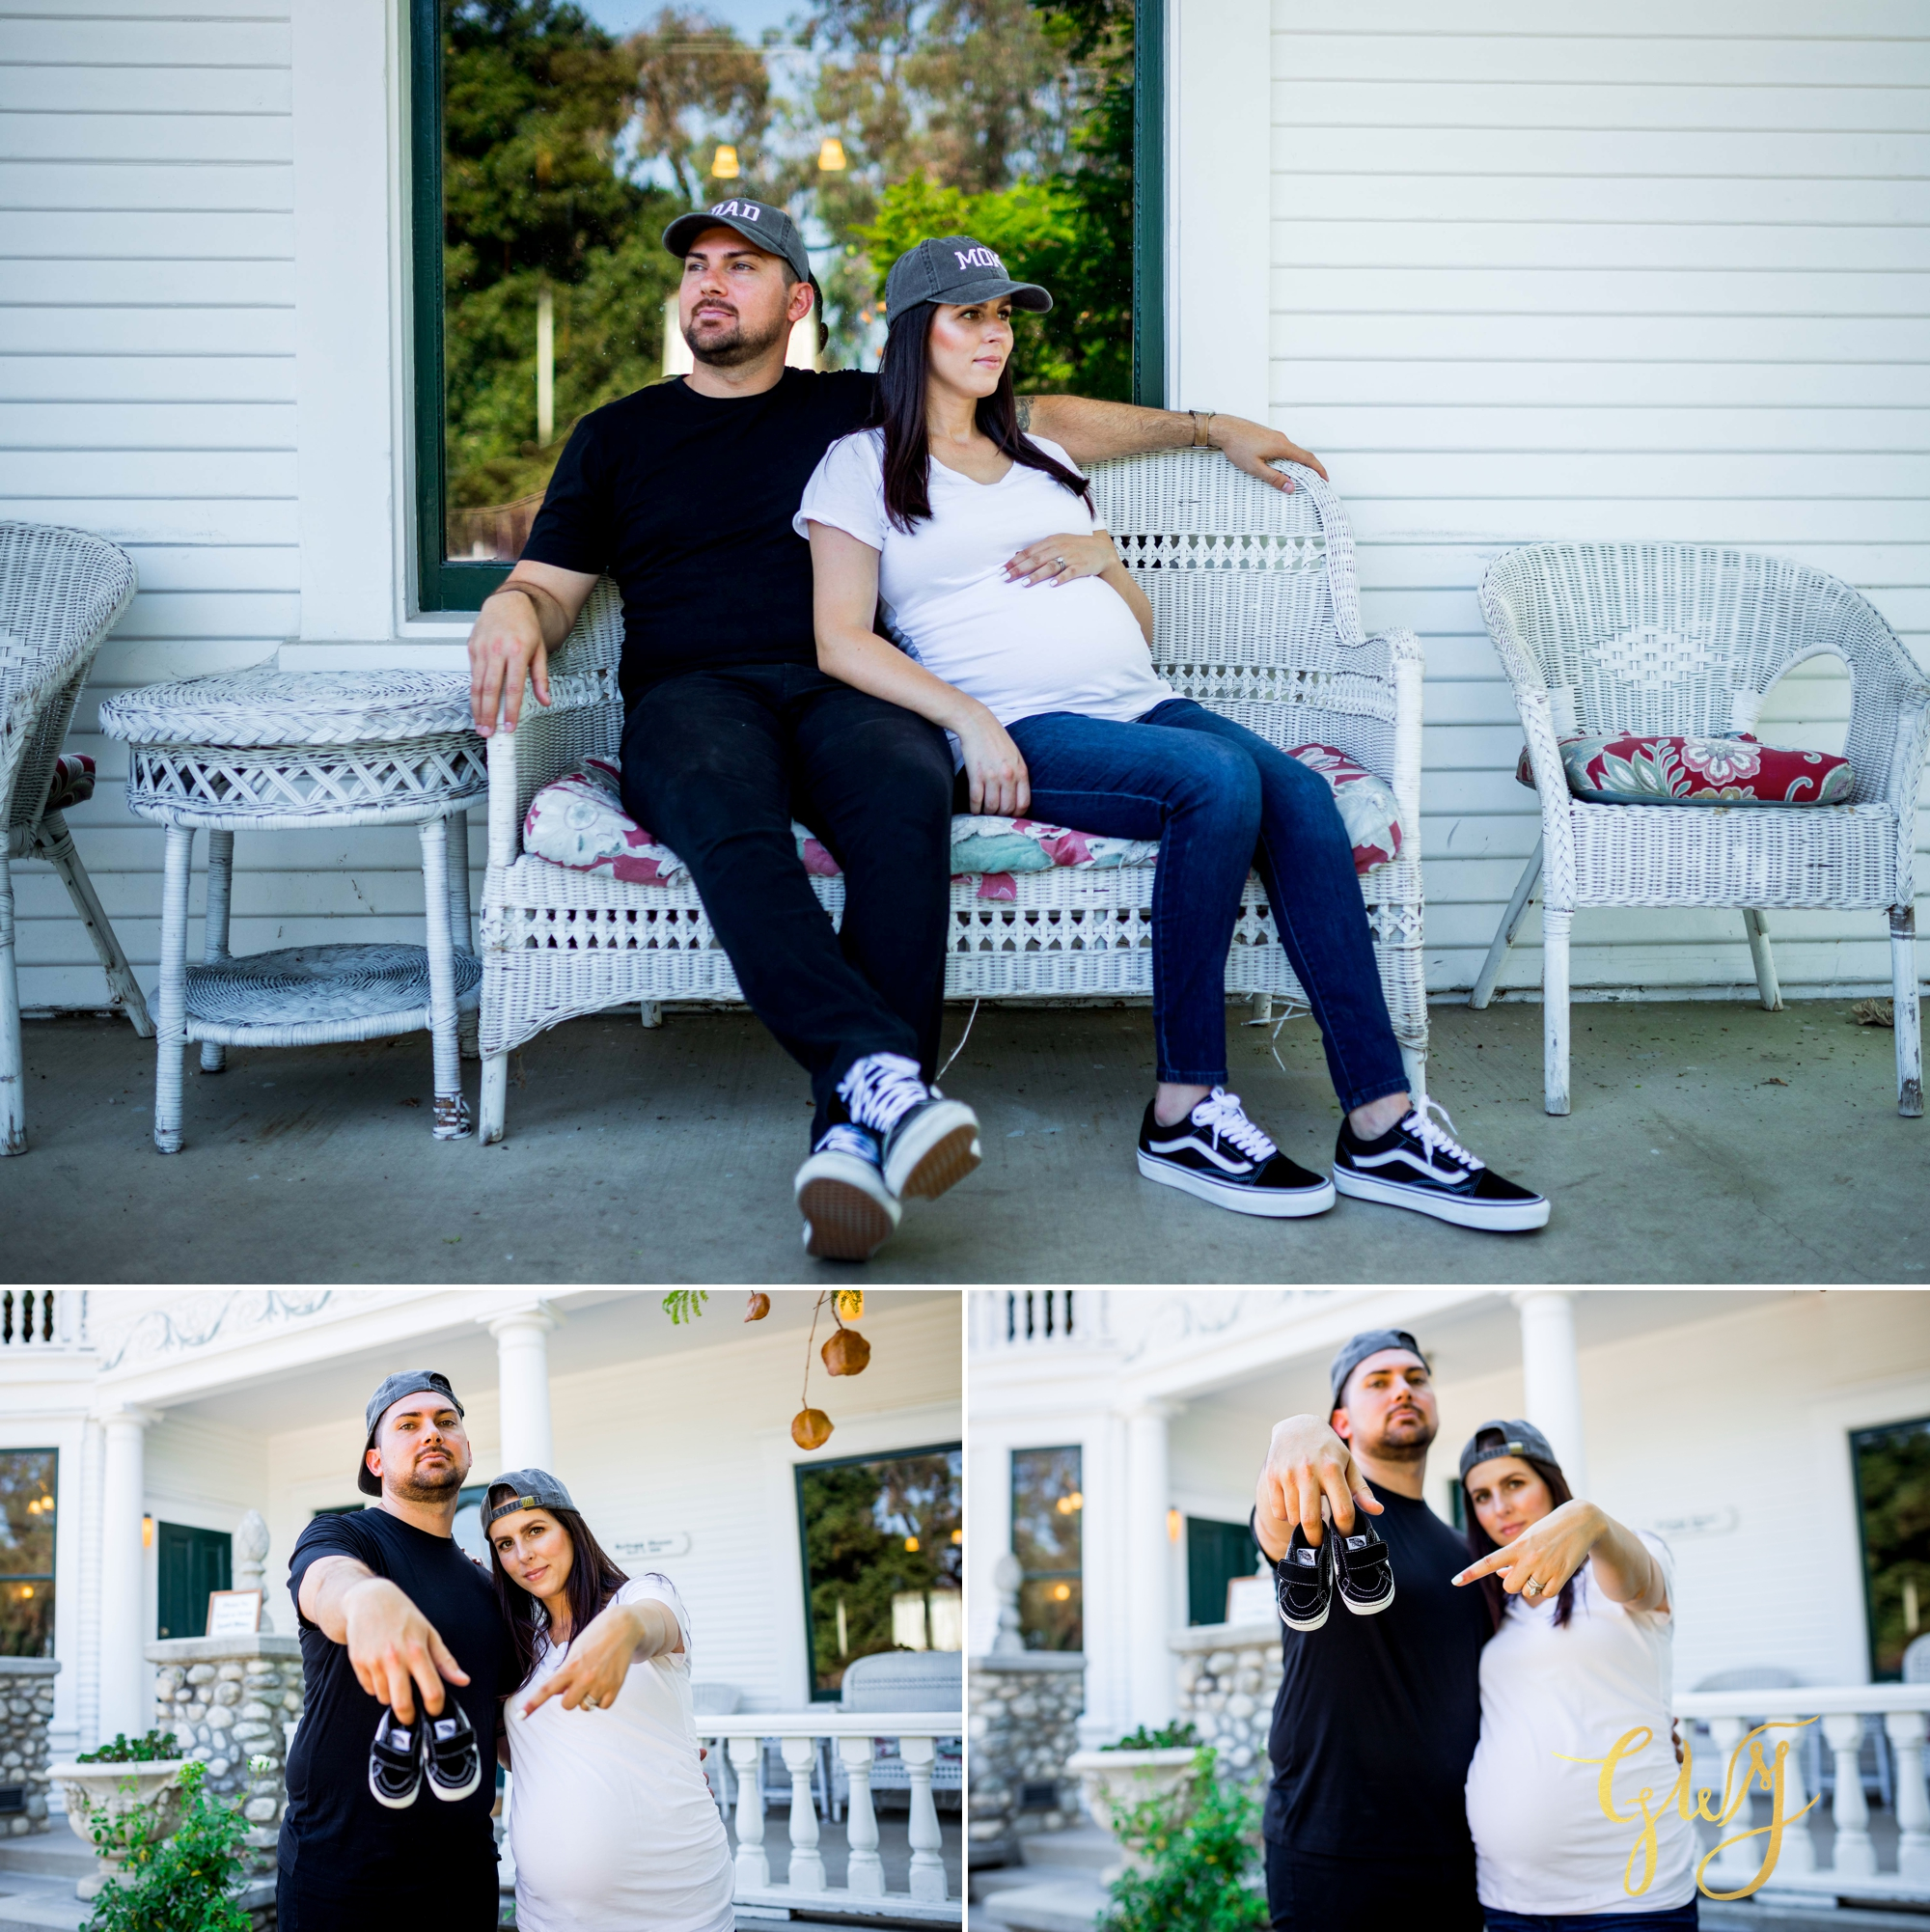 Kim + Justin's OC Heritage Museum Maternity Portrait Session by Glass Woods Media 16.jpg